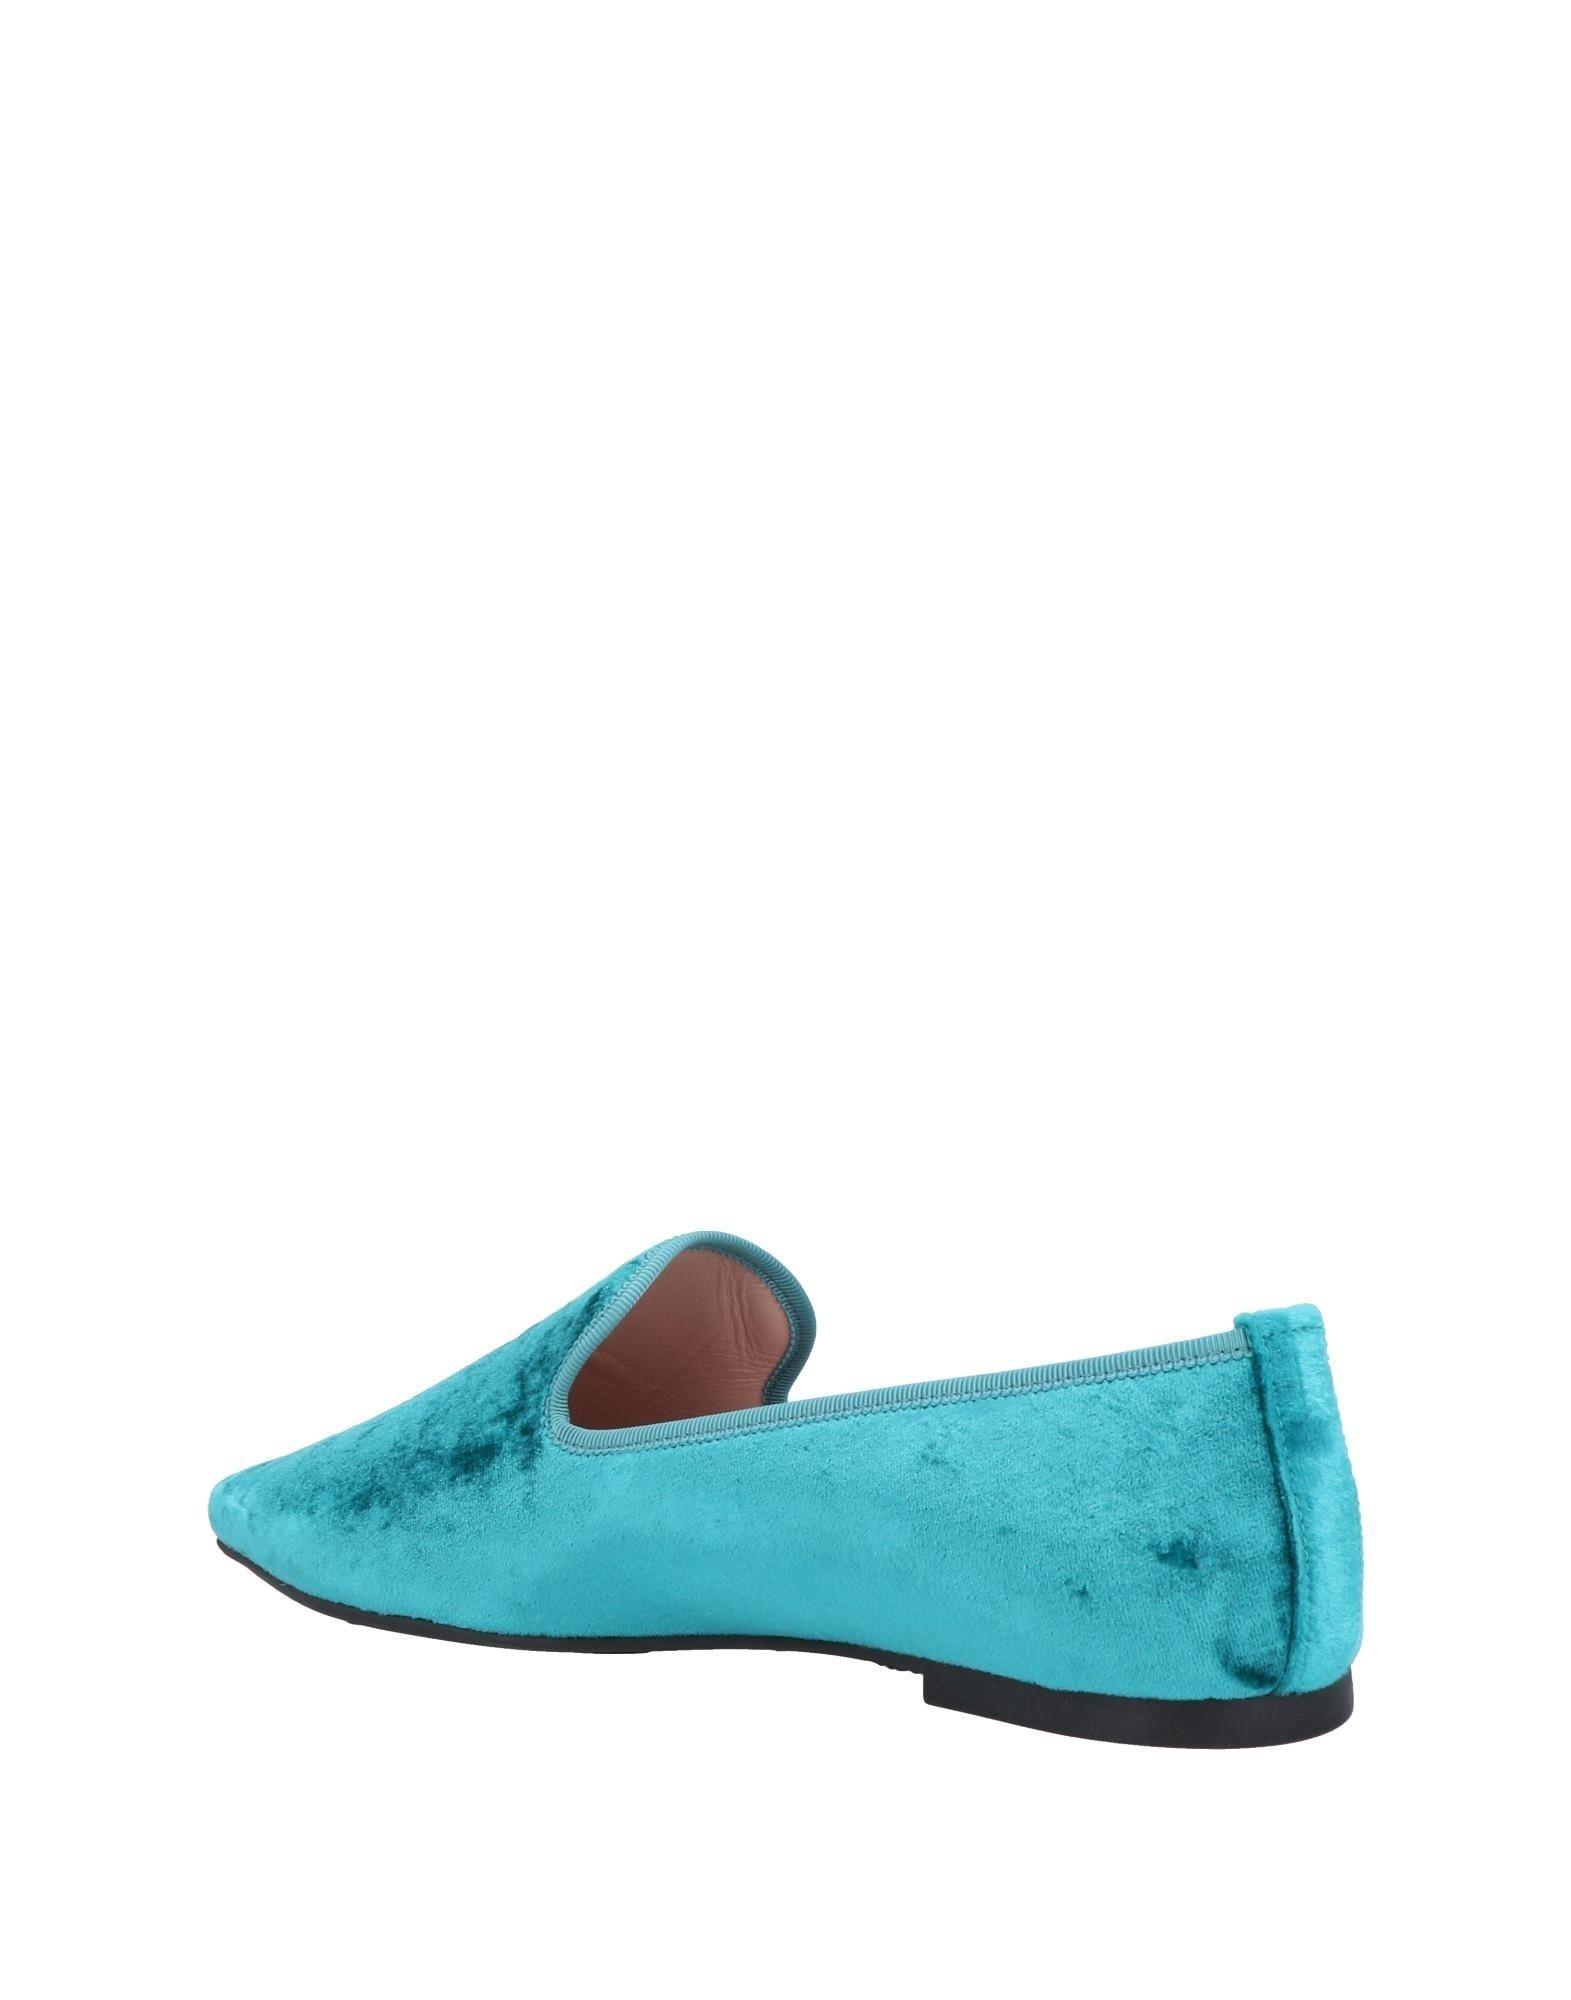 Stilvolle Stilvolle Stilvolle billige Schuhe Pretty Ballerinas Mokassins Damen  11456134OO 36007d